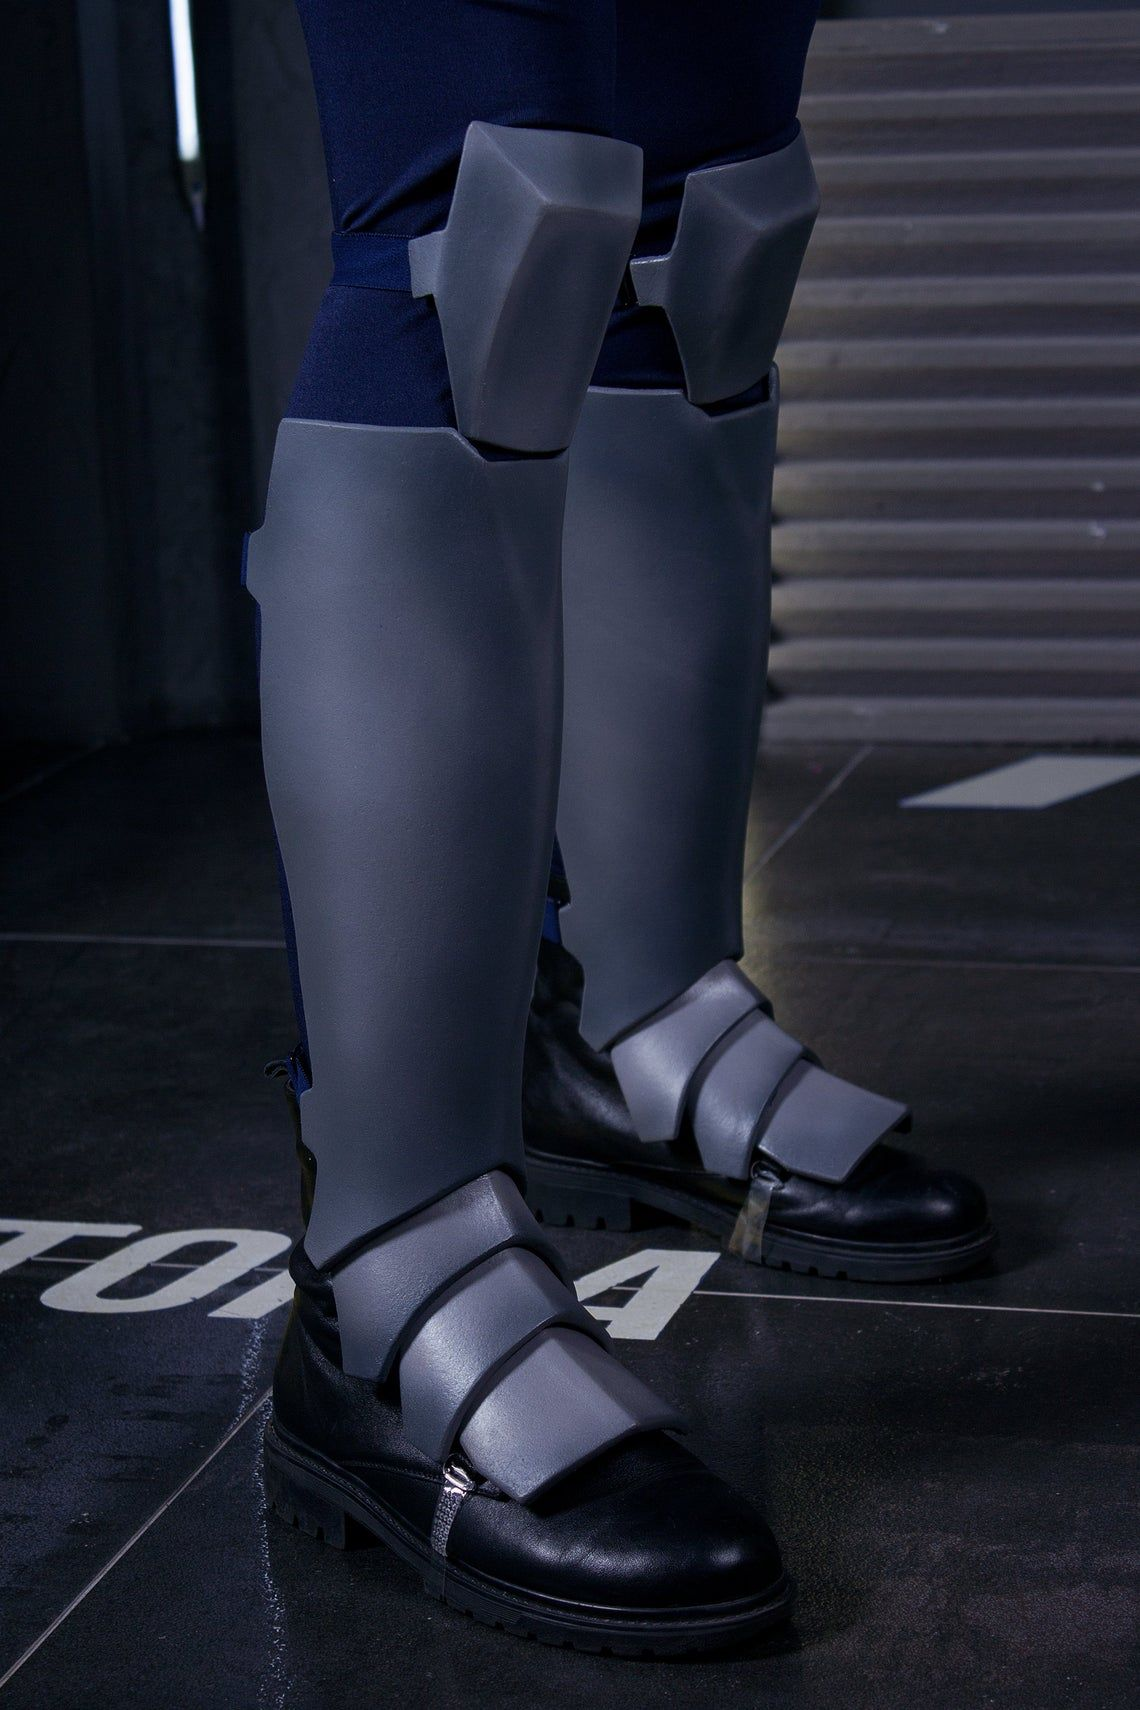 Ahsoka Tano Star Wars Clone Wars Inspired Capri Leggings